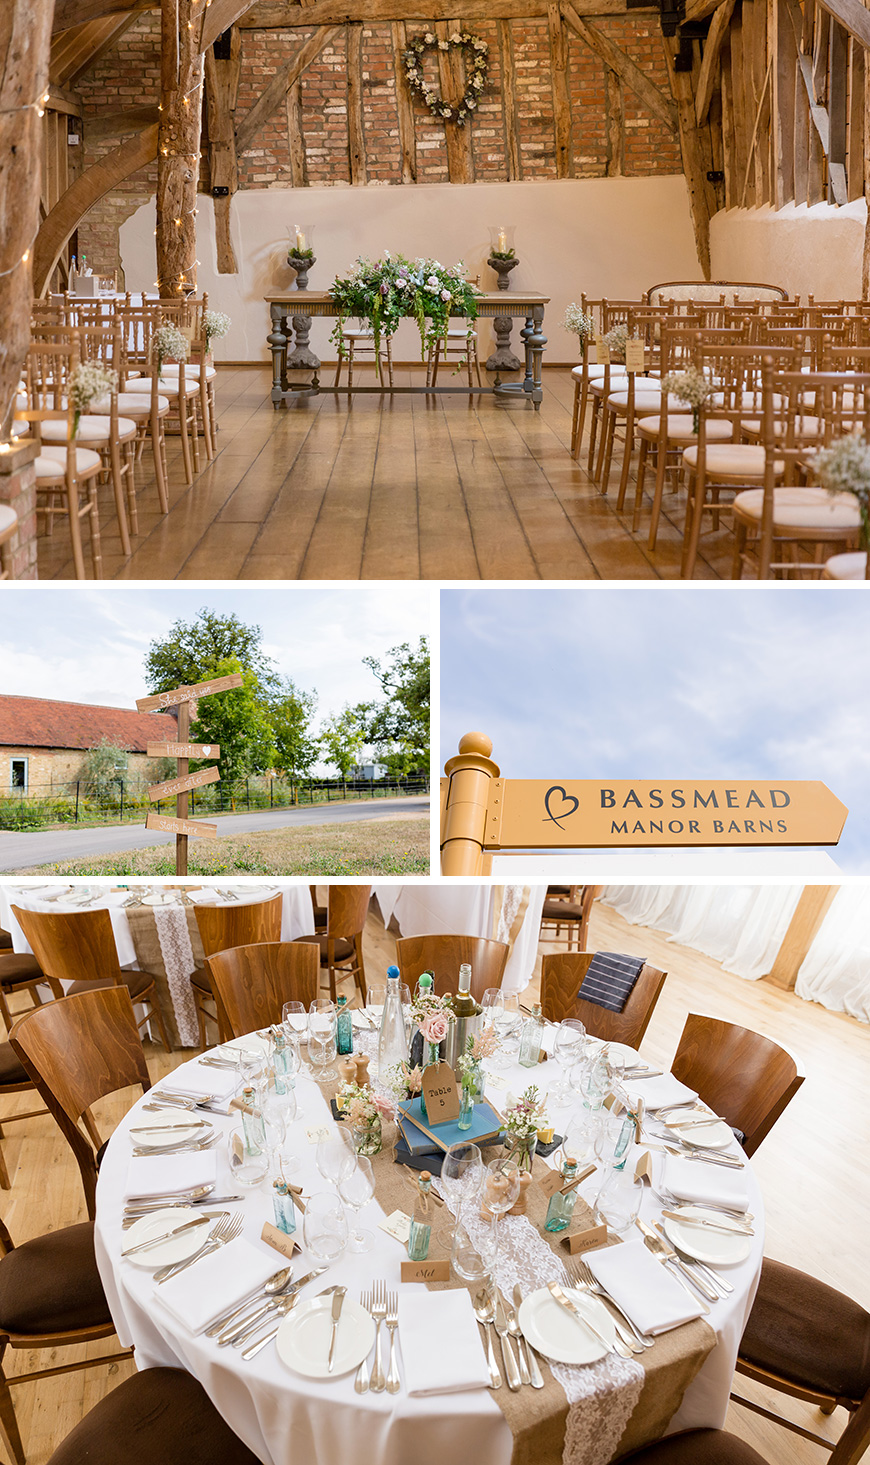 Real Wedding - Clare and Craig's Rustic Summer Wedding At Bassmead Manor Barns | CHWV